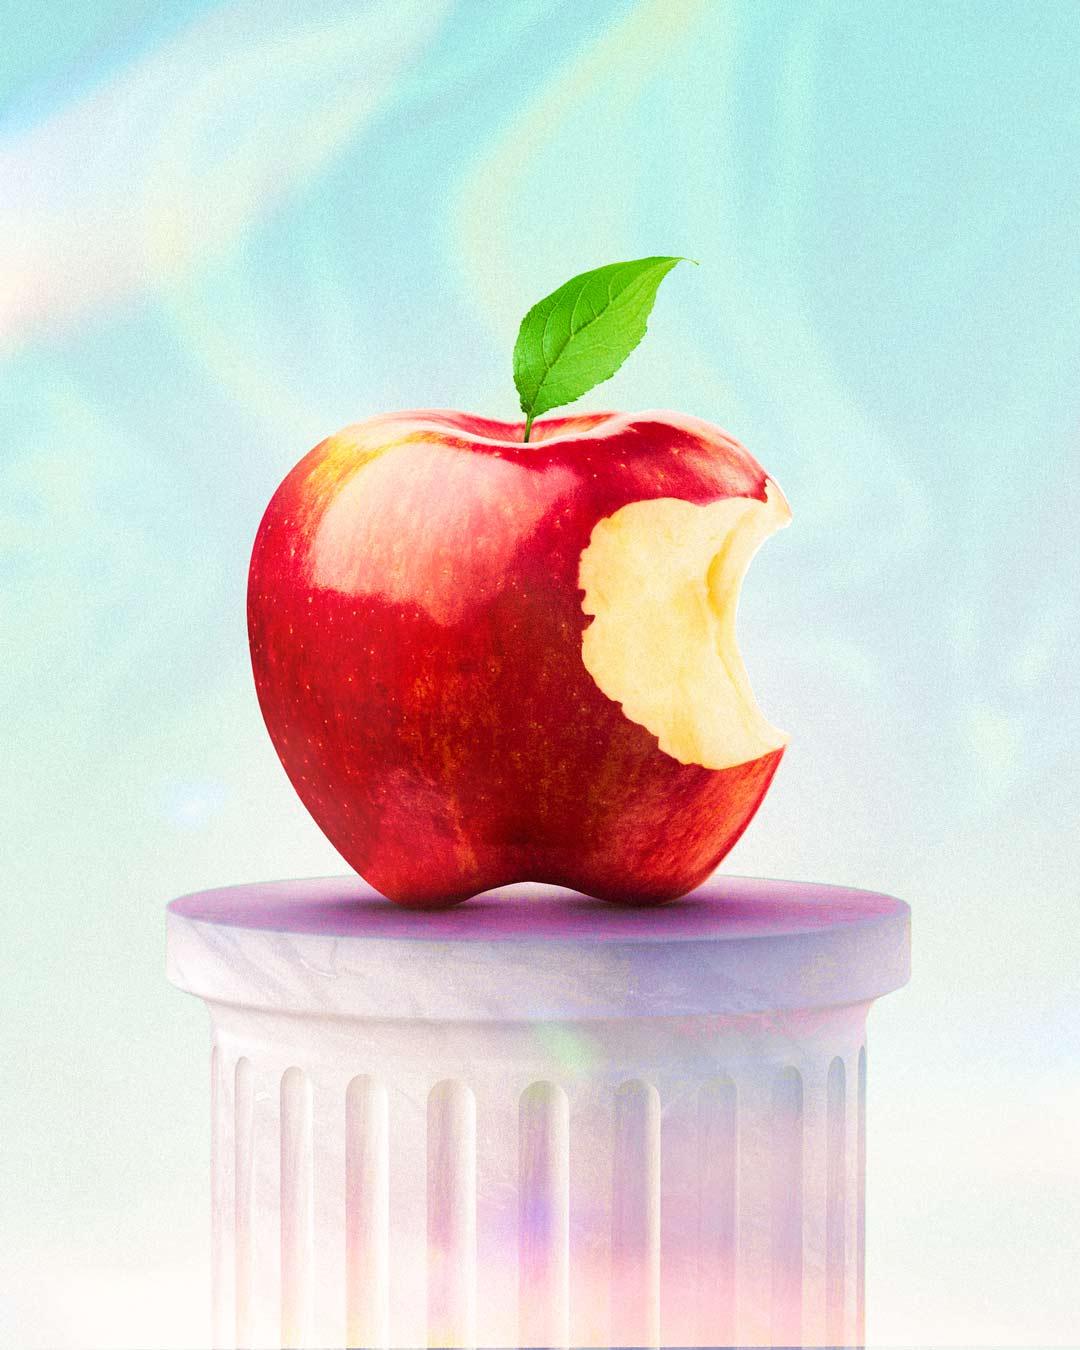 Modern apple logo by Adam Ingle